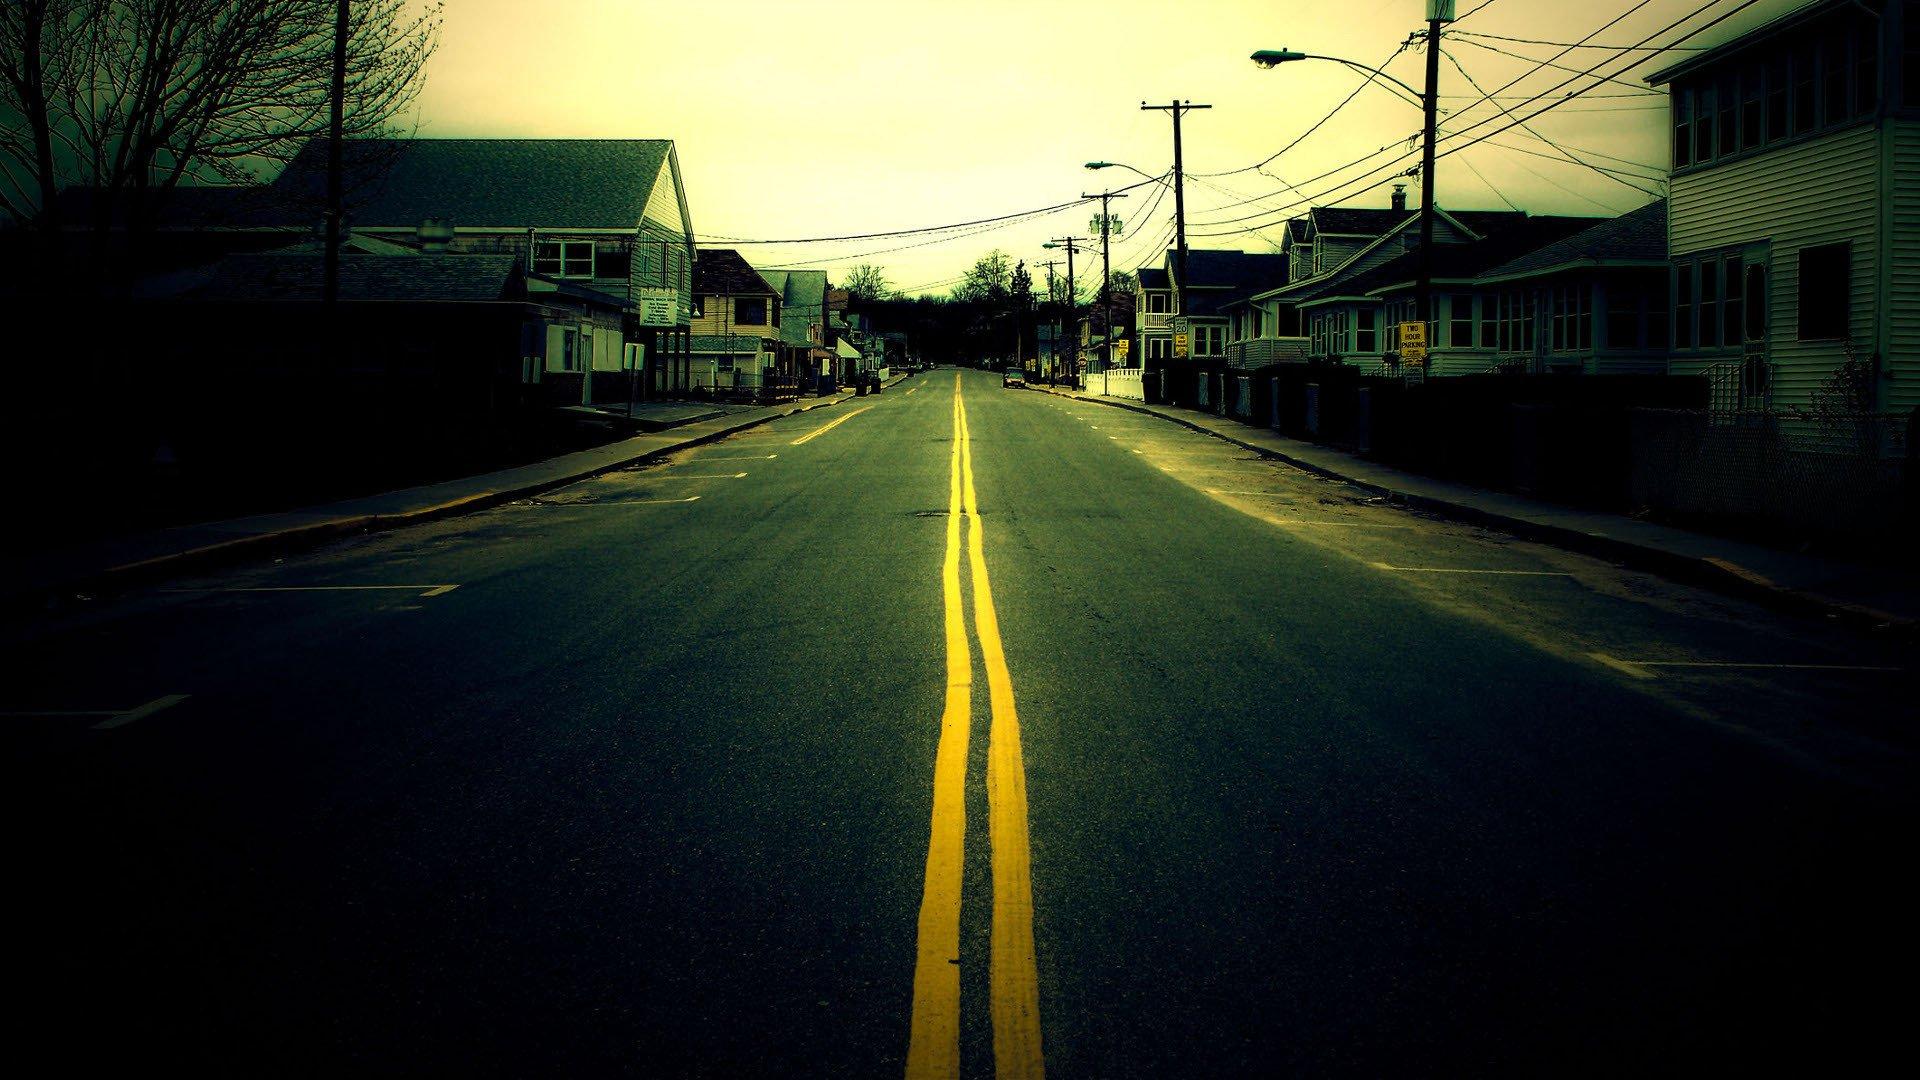 Картинка коричневой дороги на аву